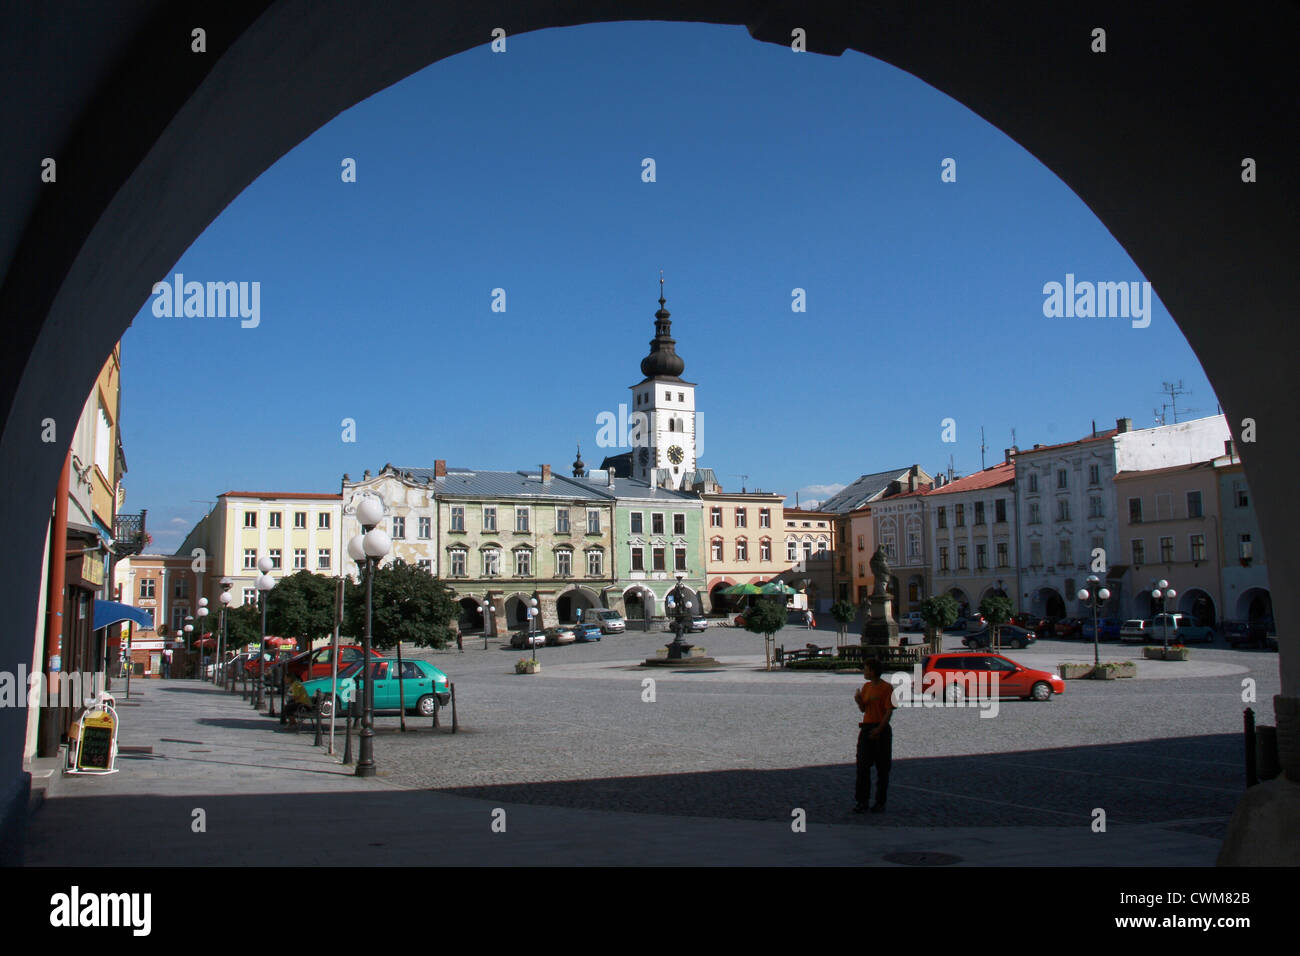 Pribor, Square of Sigmund Freud - Stock Image